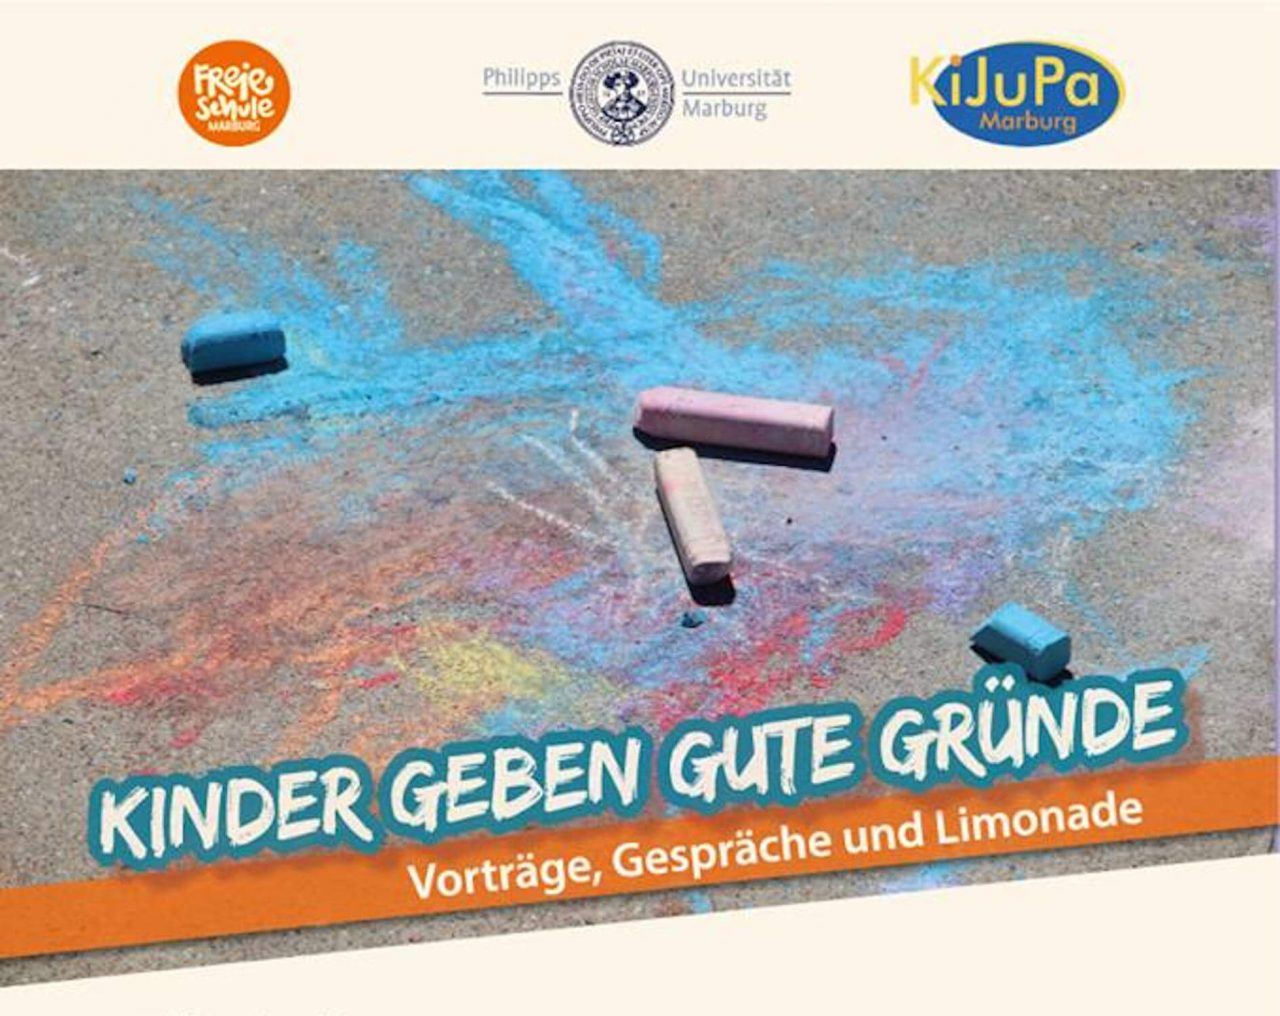 https://www.freie-schule-marburg.de/wp-content/uploads/Kinder-geben-gute-Gruende-1280x1016.jpg